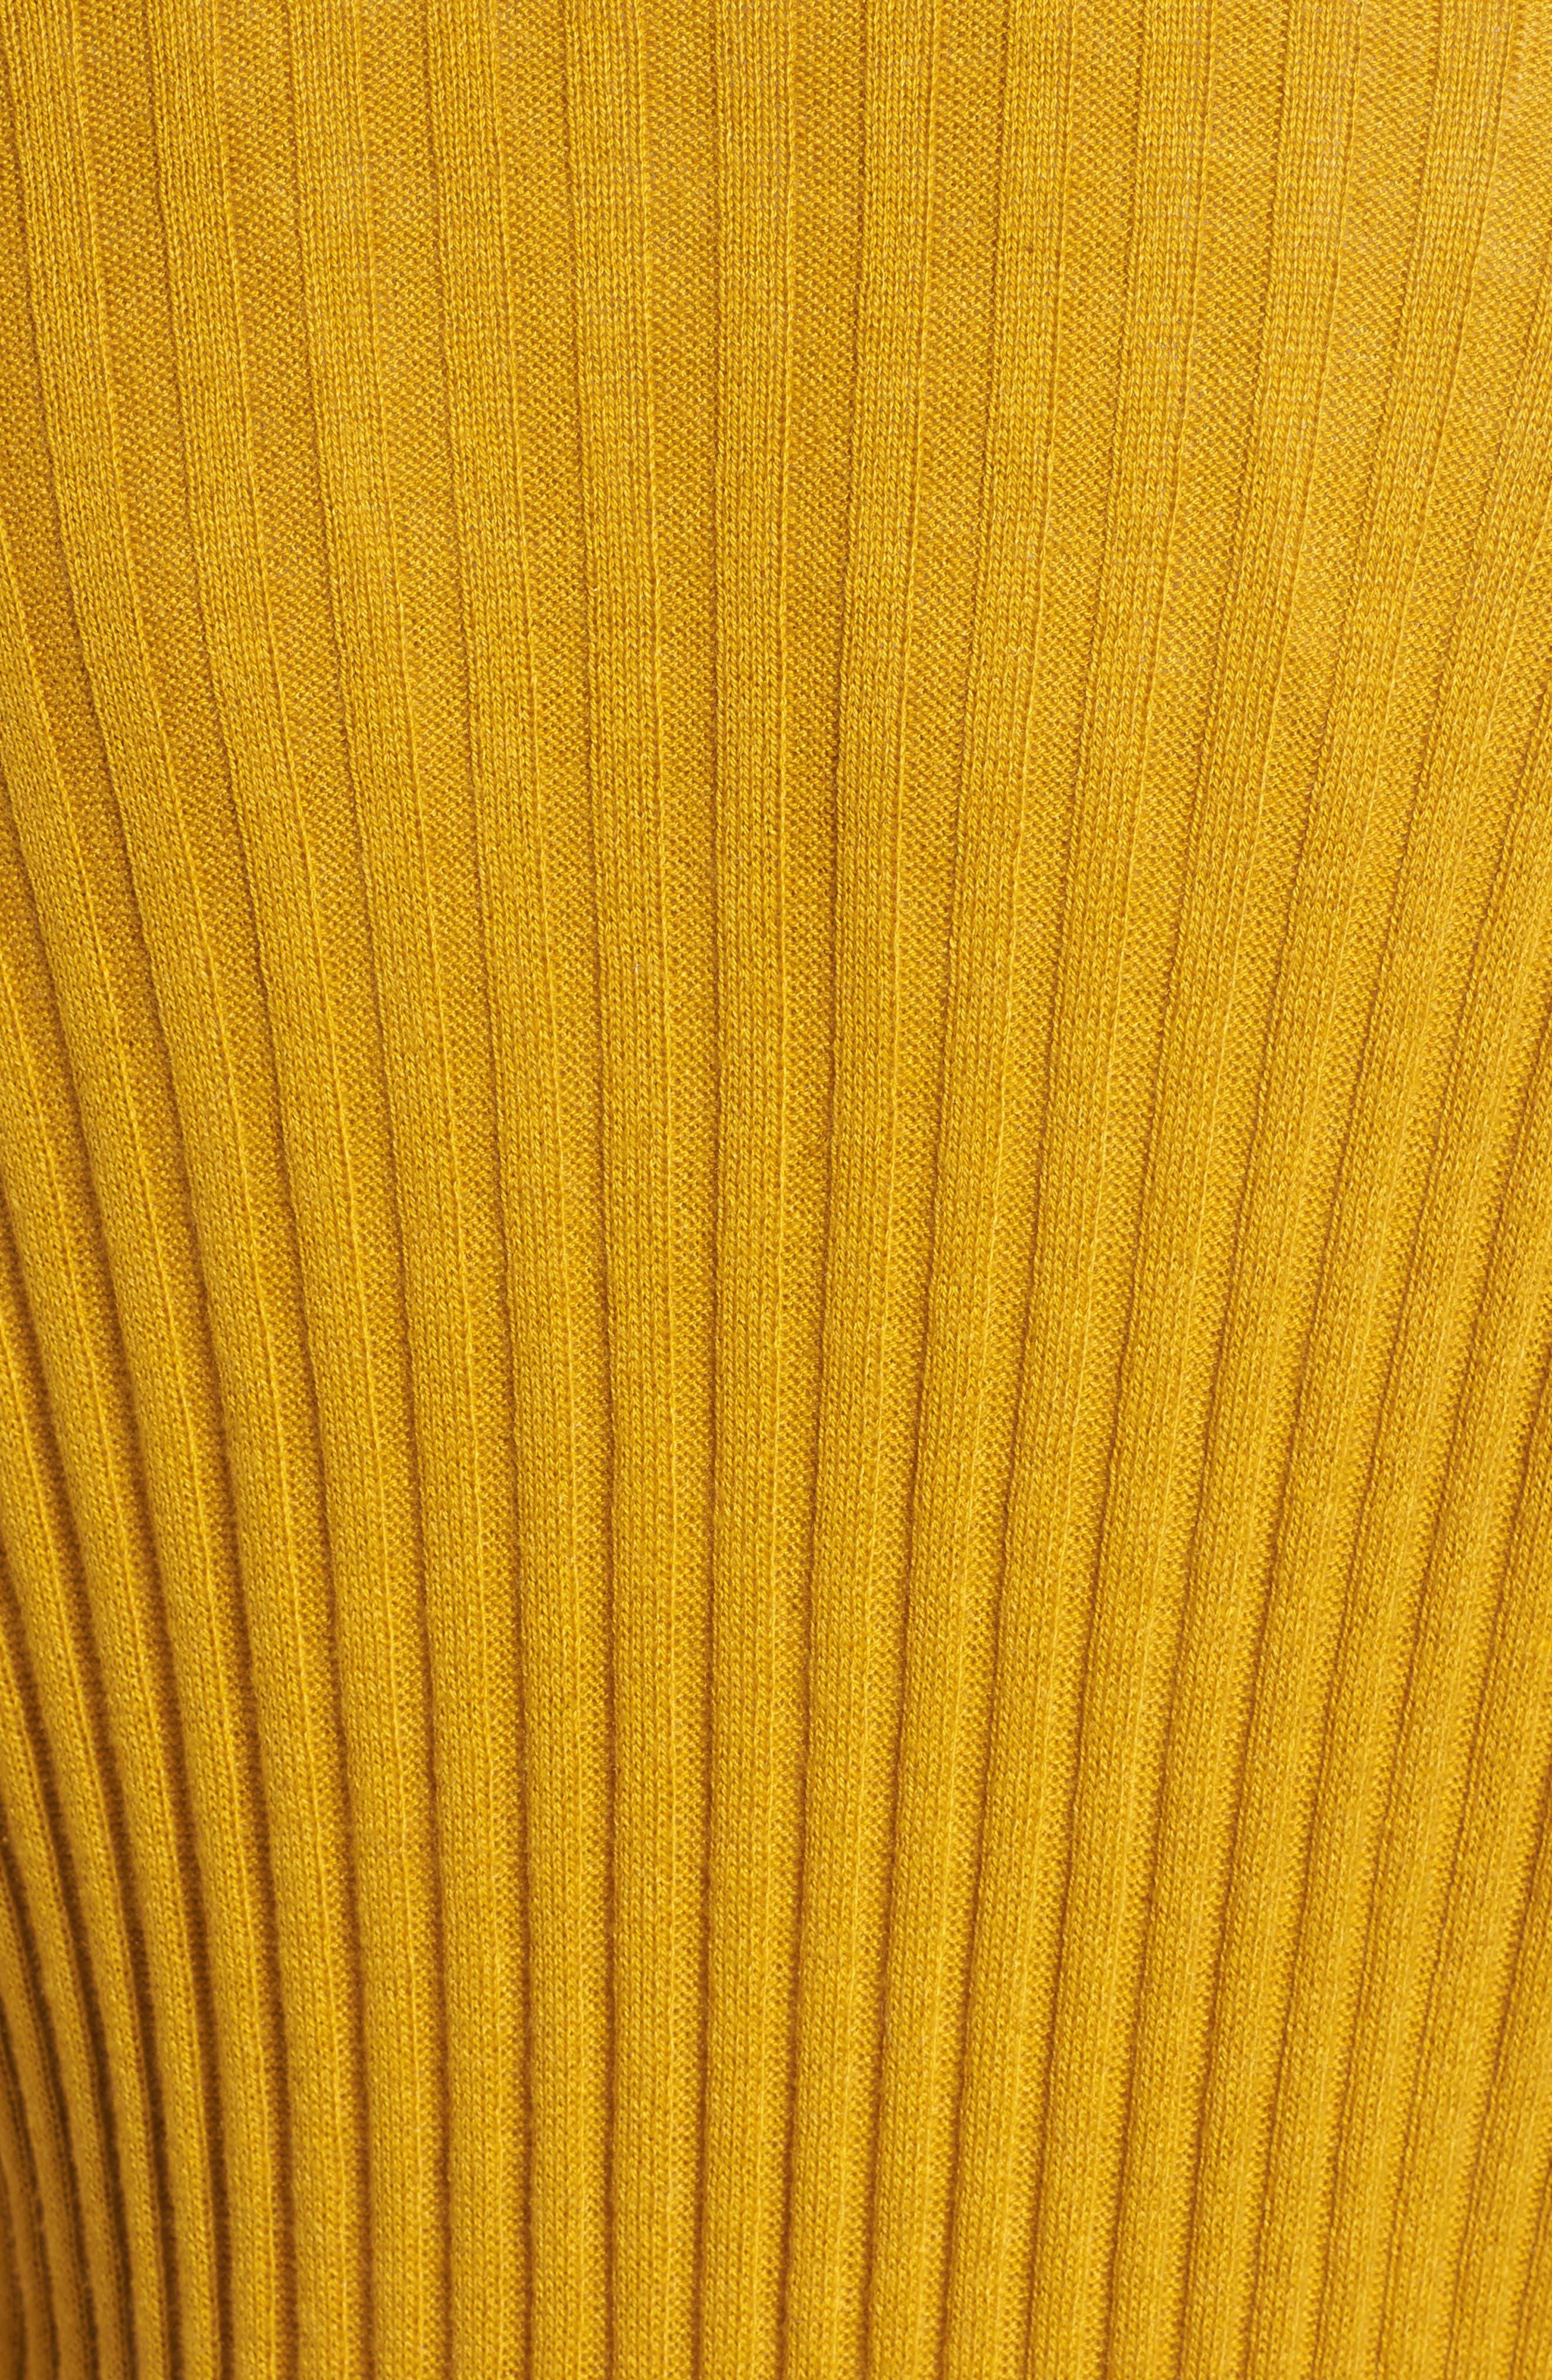 Rib Knit Midi Cardigan,                             Alternate thumbnail 7, color,                             Olive Arrowwood